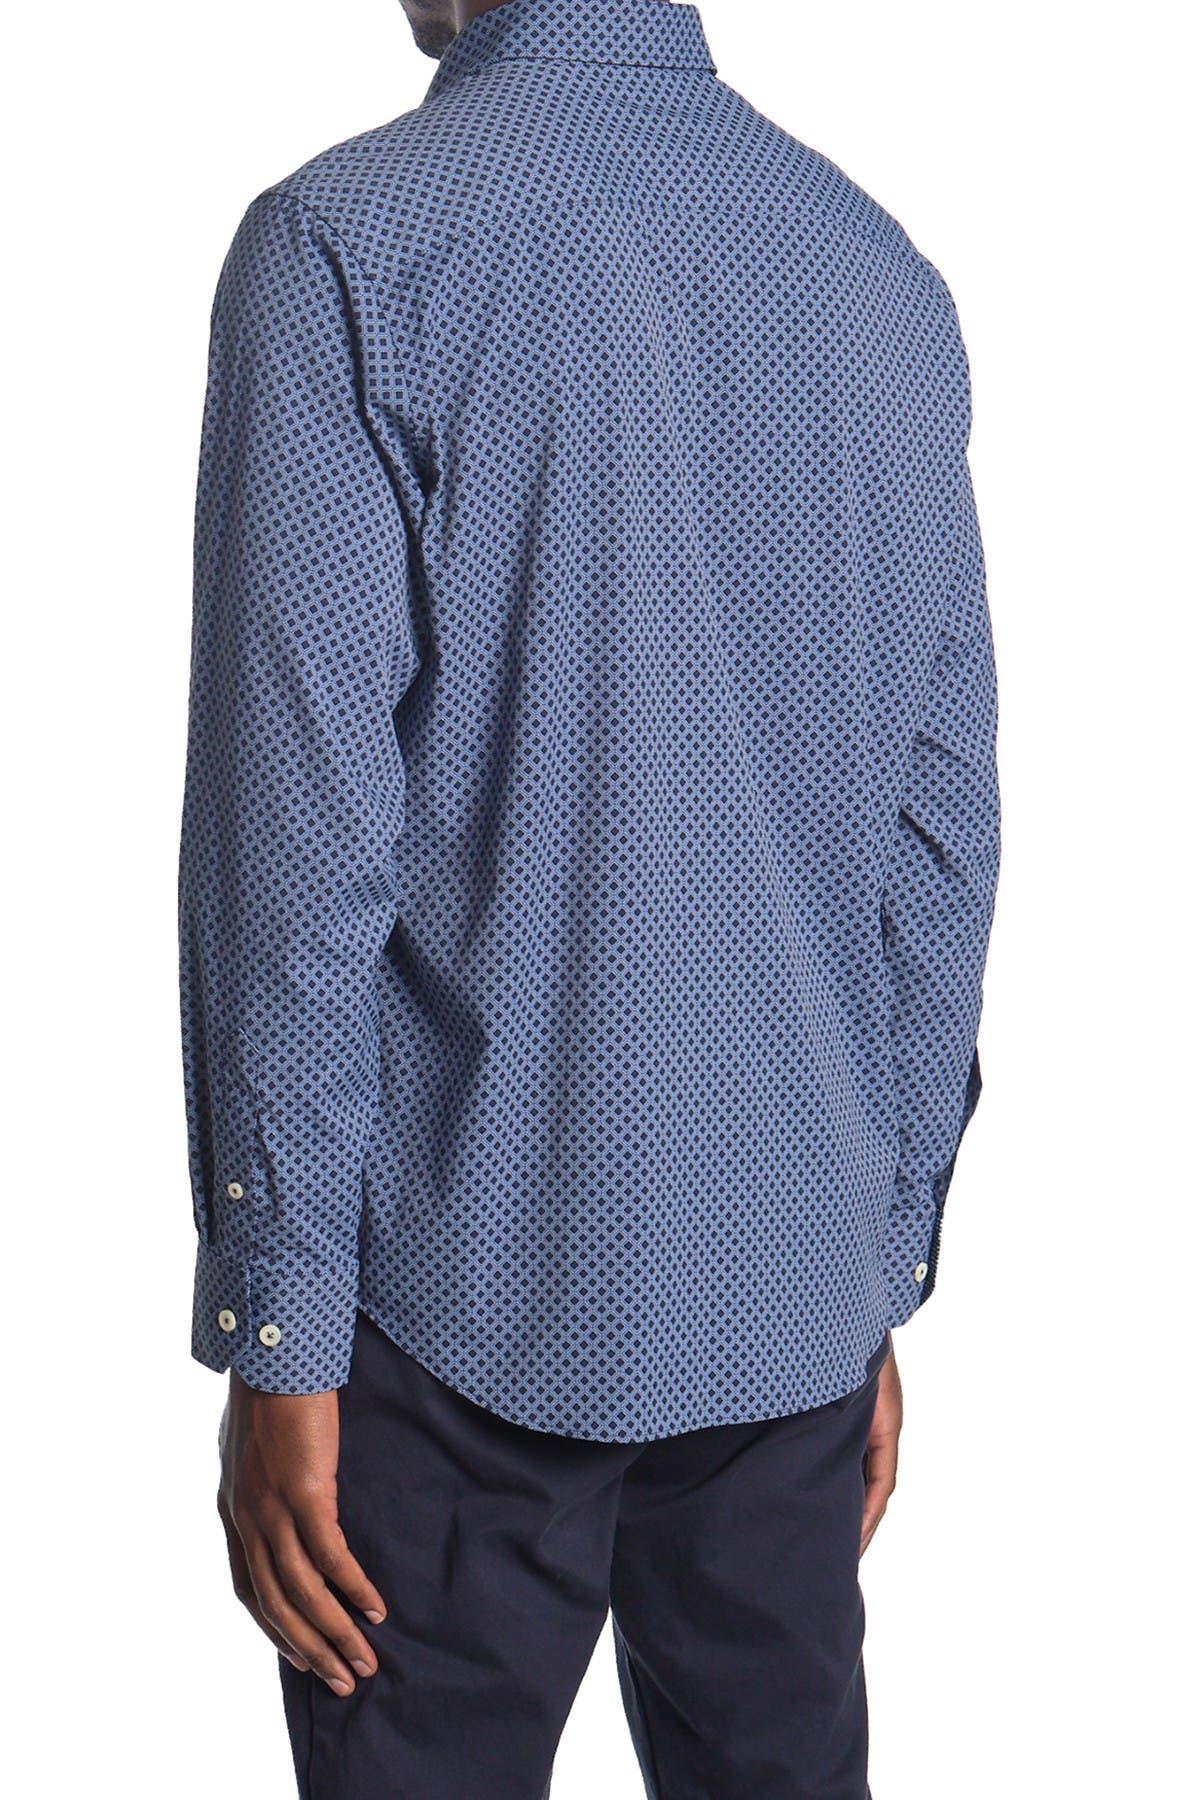 Image of Bugatchi Micro Print Regular Fit Shirt